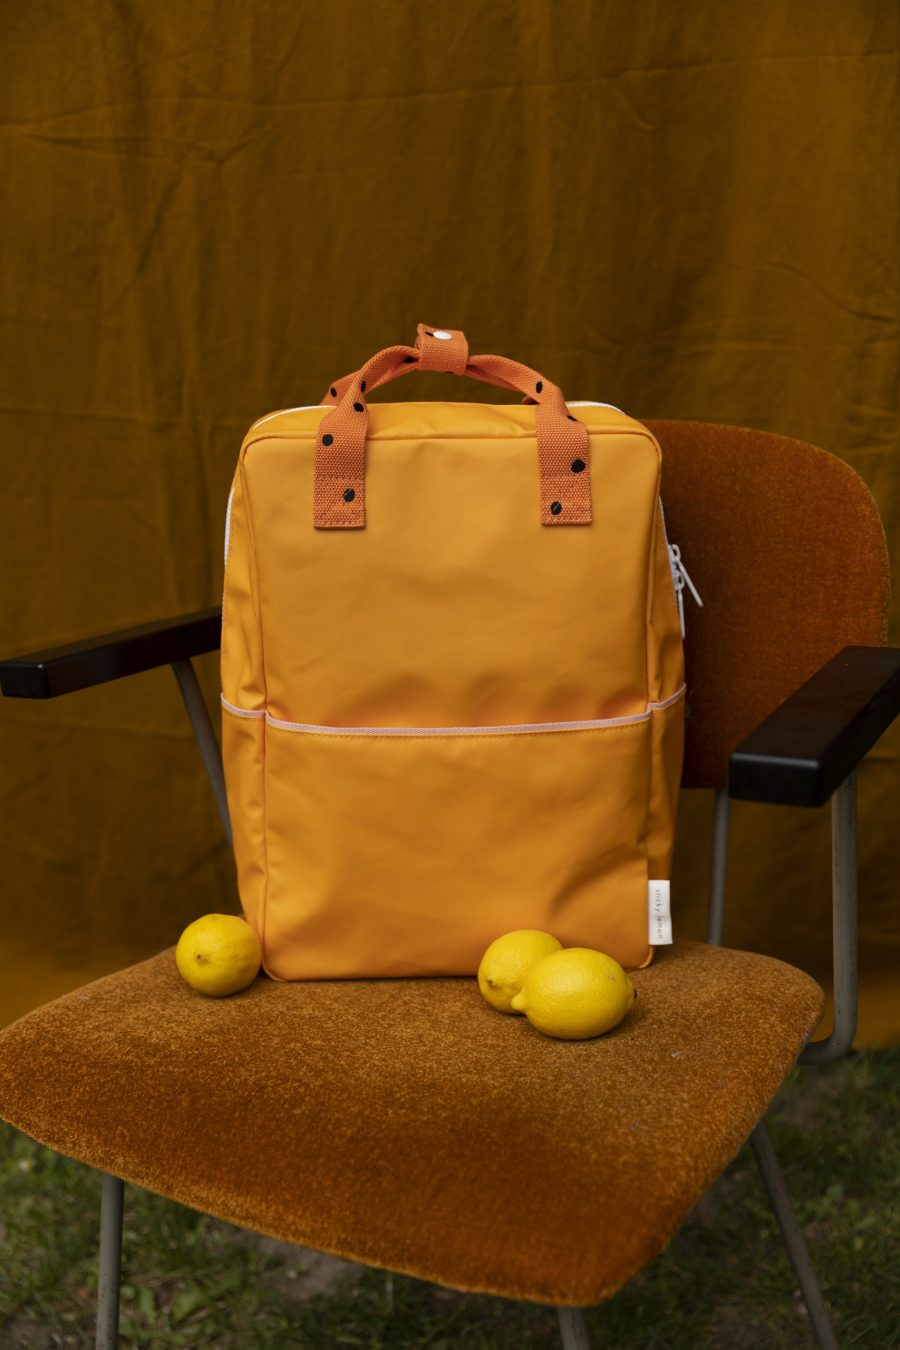 1801644 – Sticky Lemon – backpack large – freckles – sunny yellow + carrot orange – style shot 0